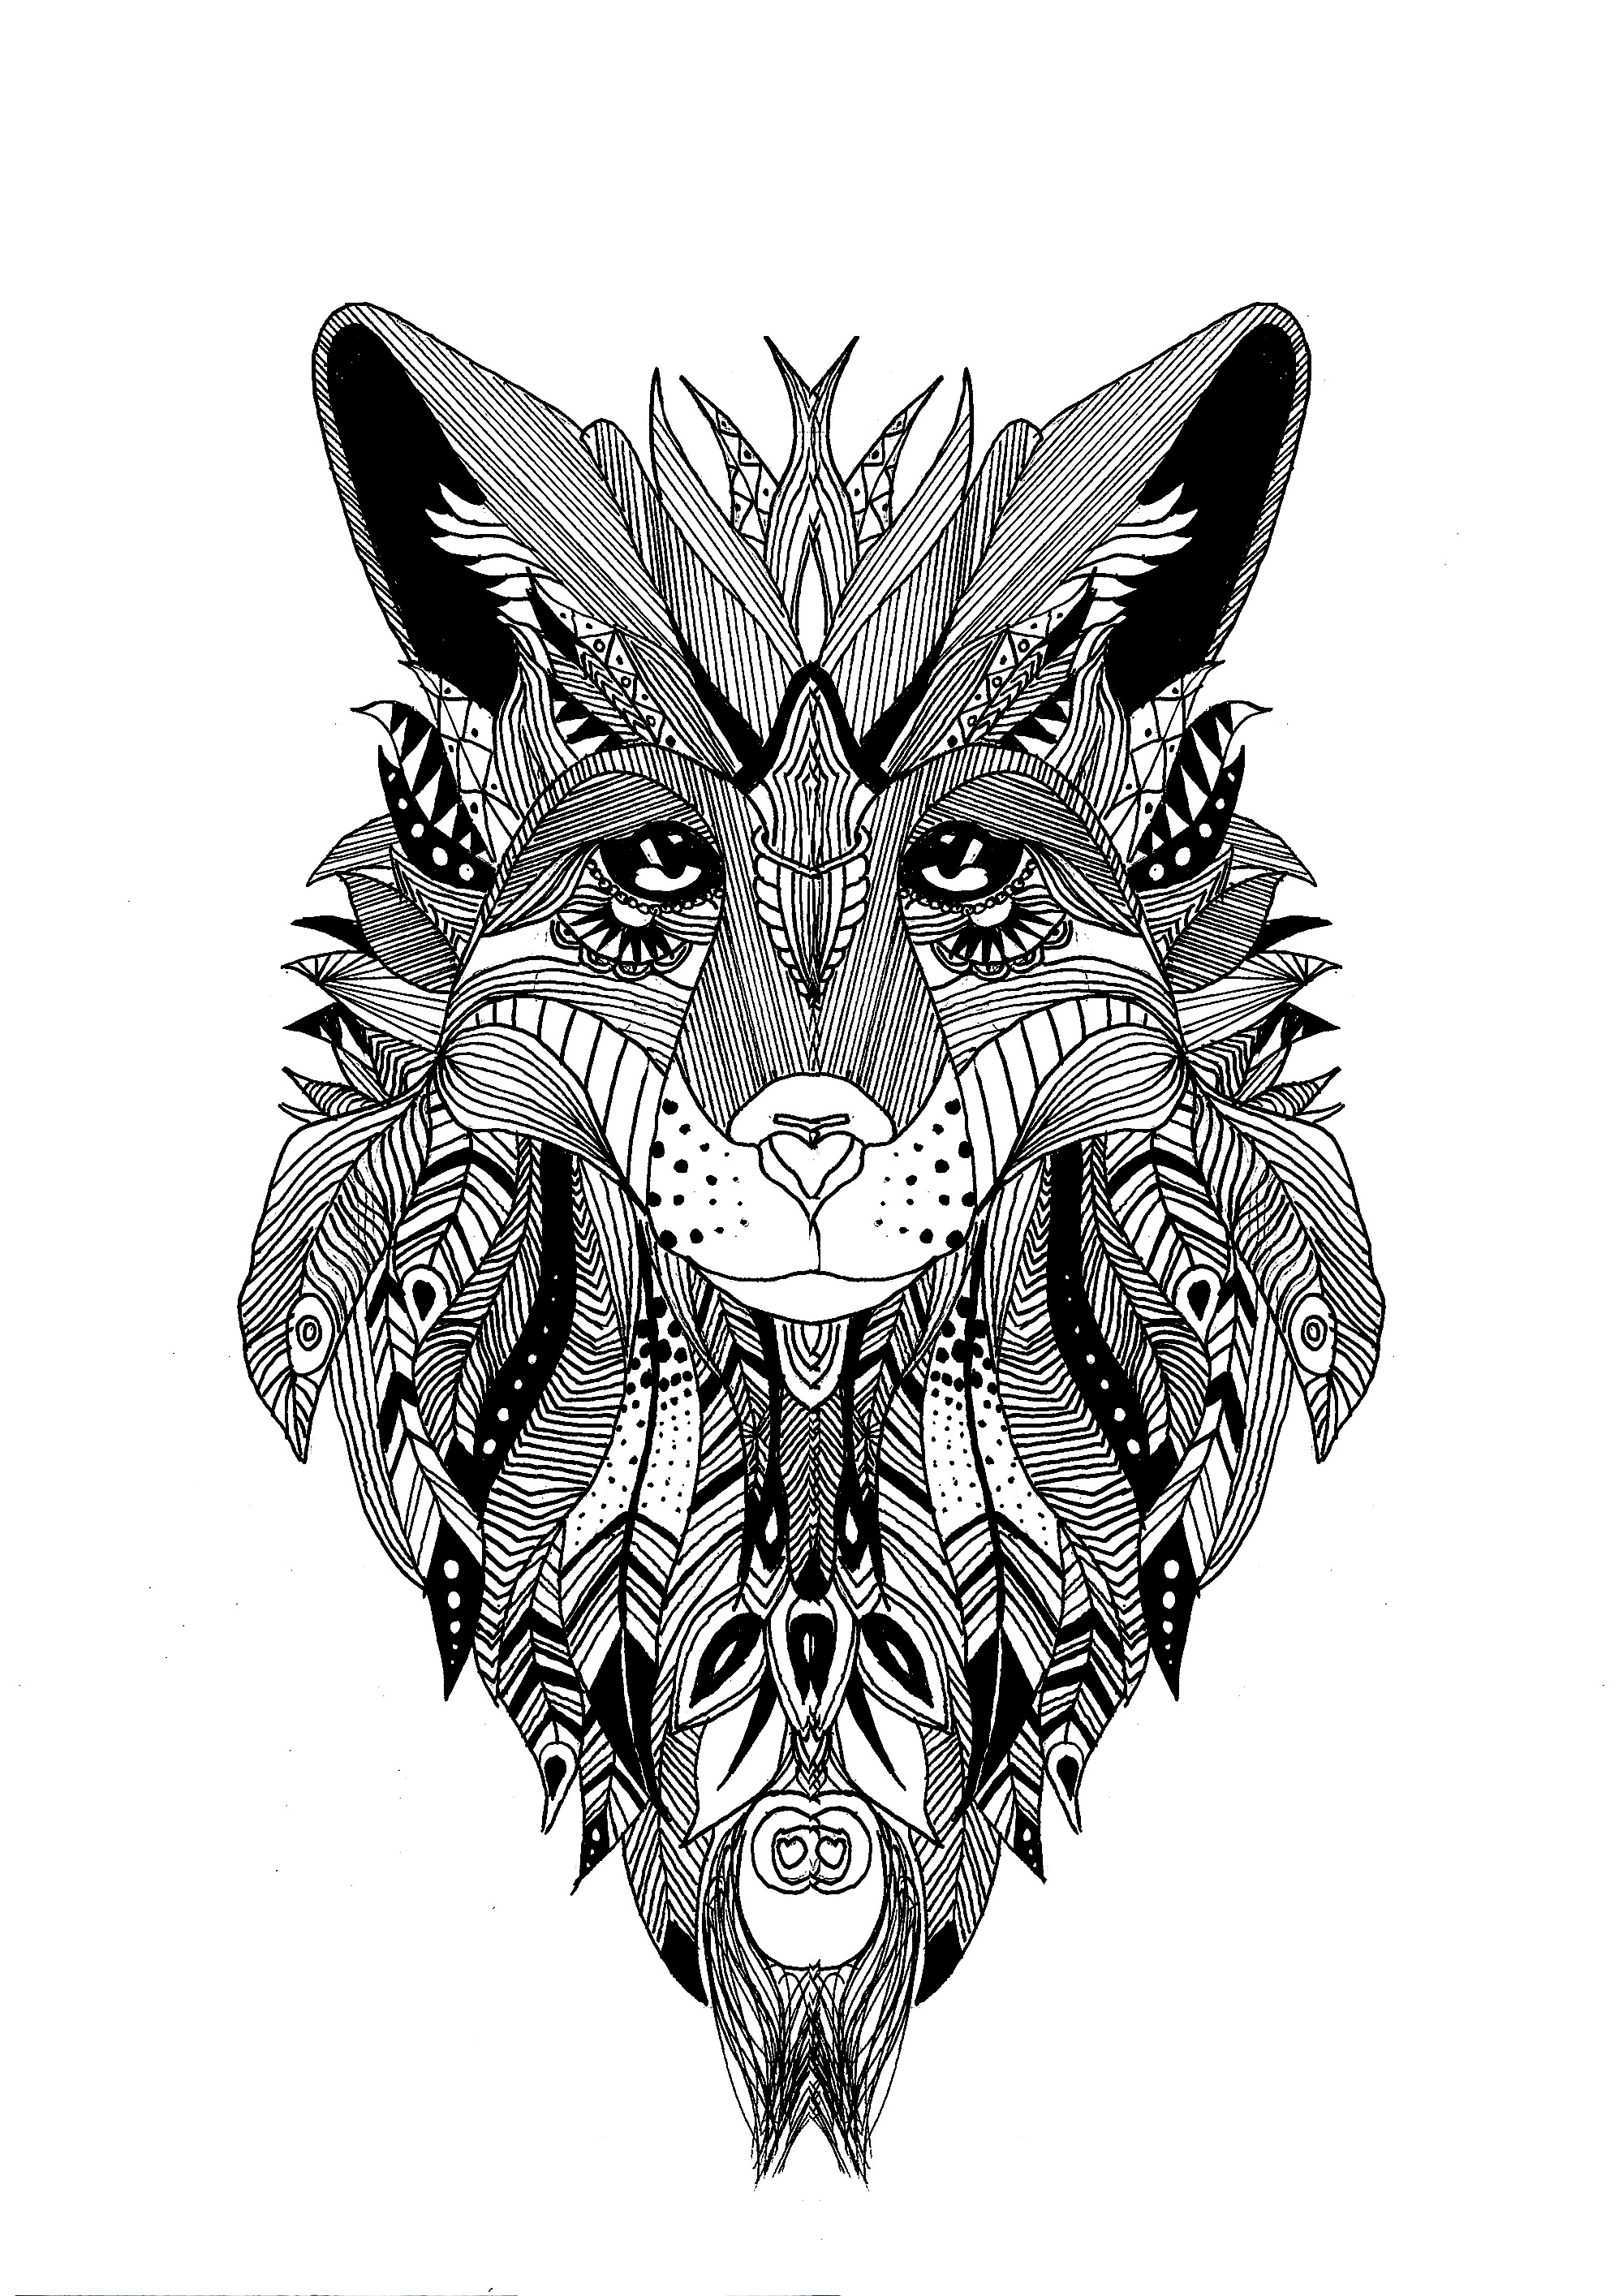 Zentangle 53826 - Zentangle - Malbuch Fur Erwachsene